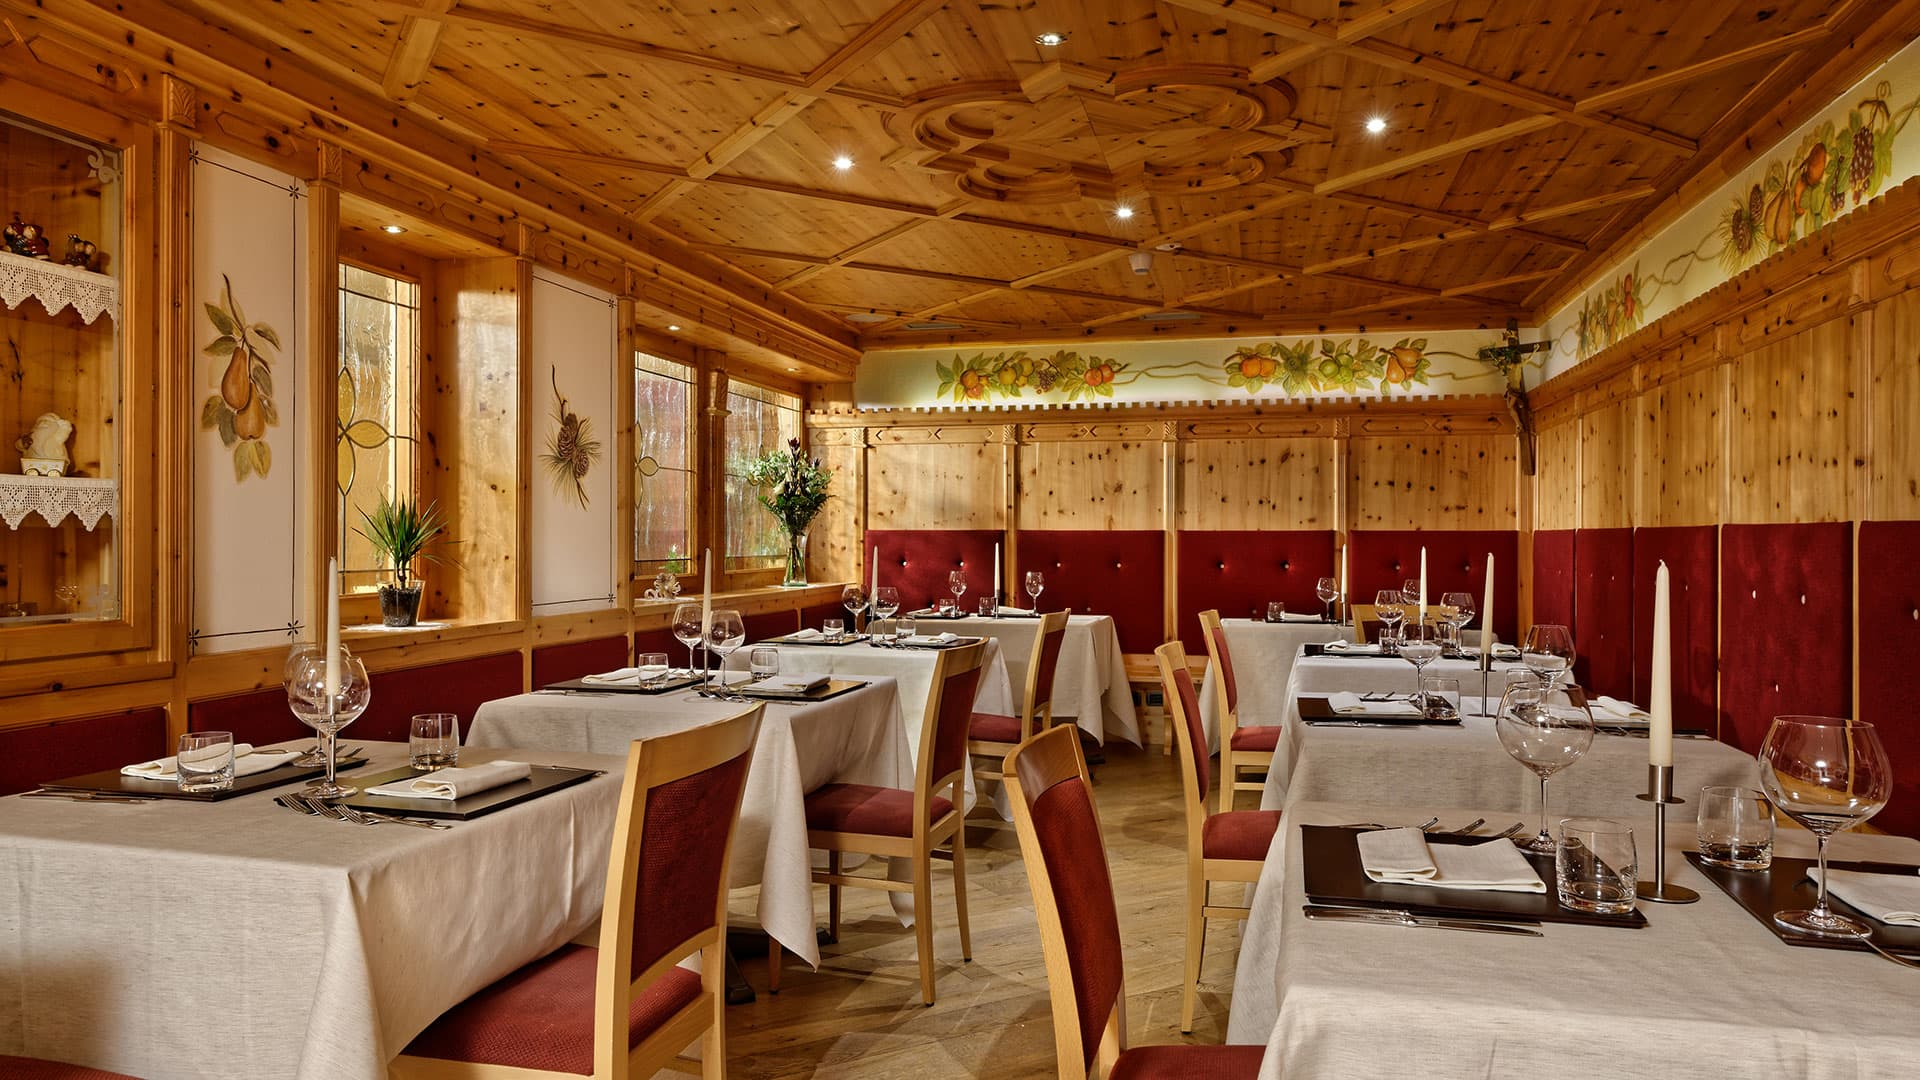 Stube diana ihr restaurant in madonna di campiglio for Gourmet hotels